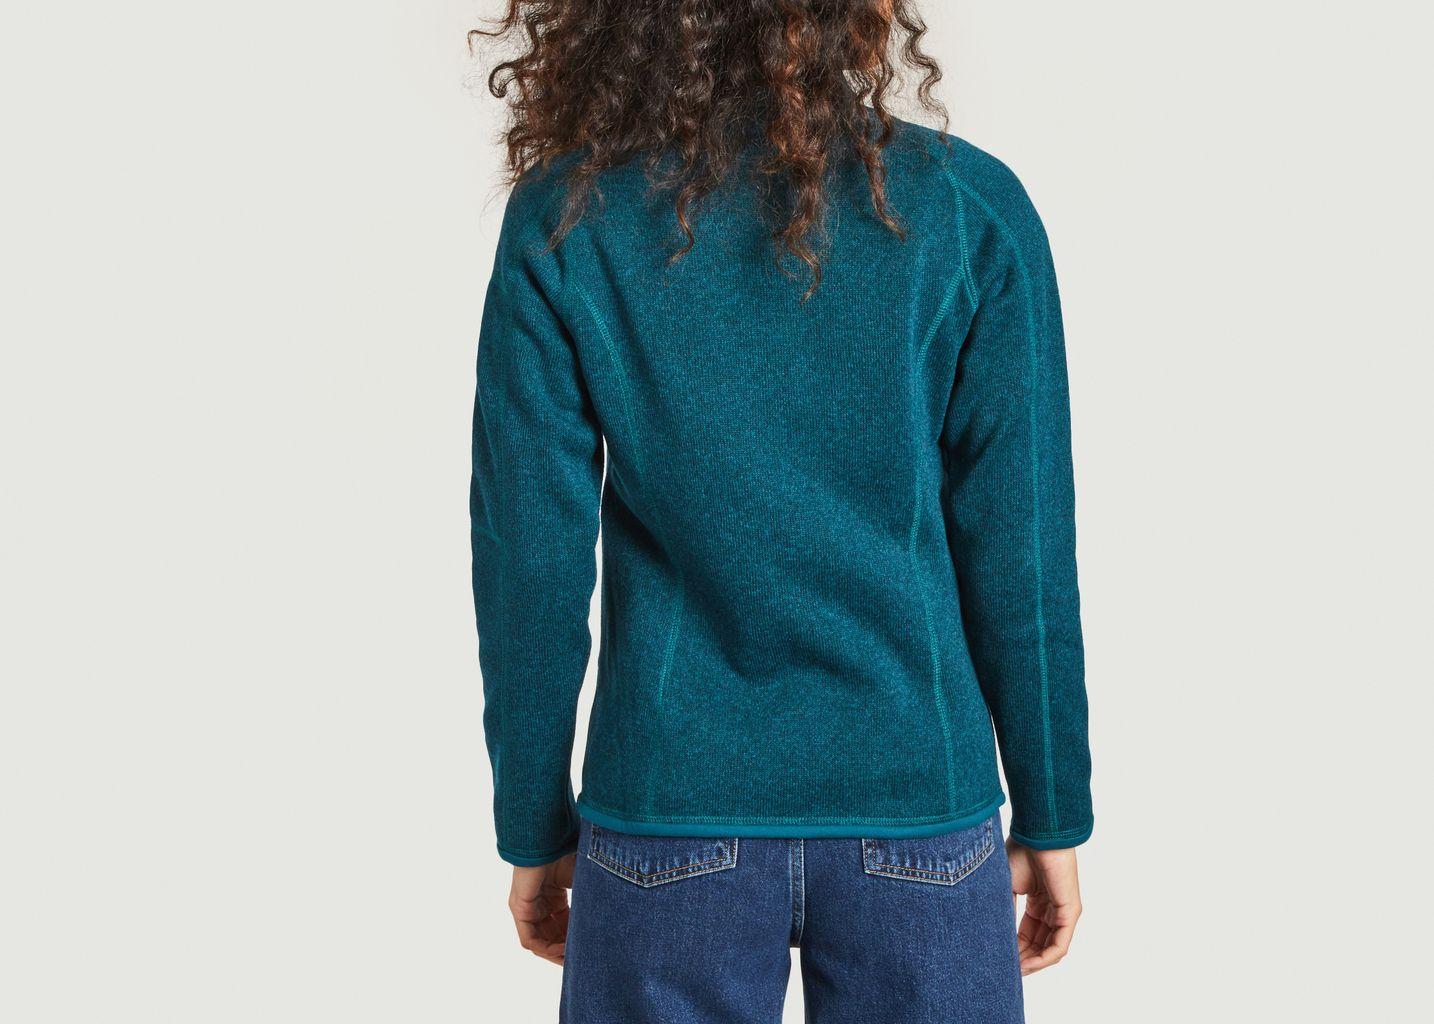 Veste polaire zippée Better Sweater - Patagonia